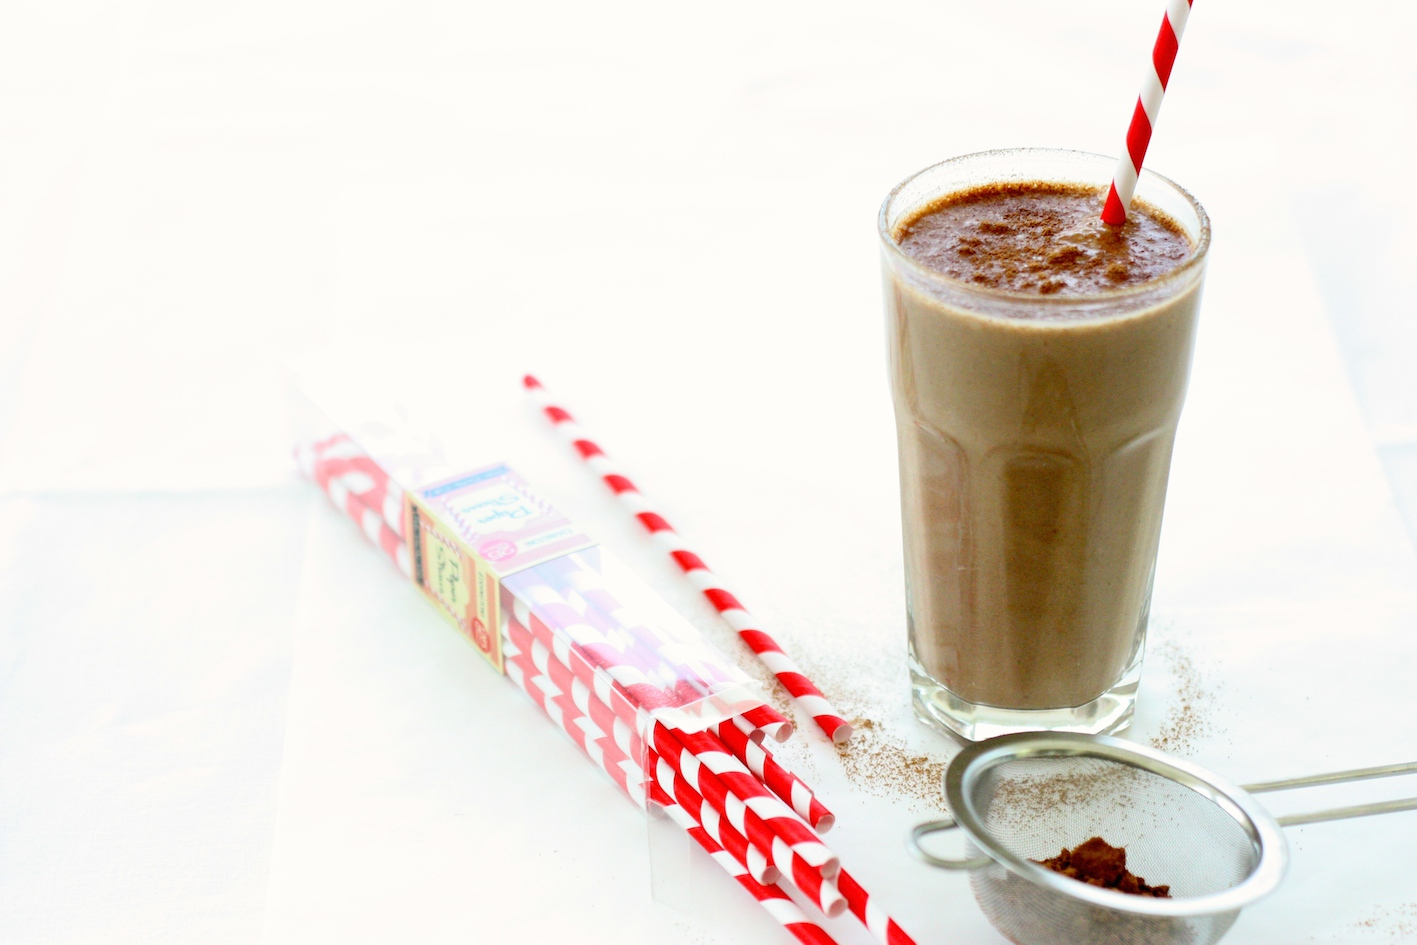 healthy-chocolate-peanut-butter-shake- landscape